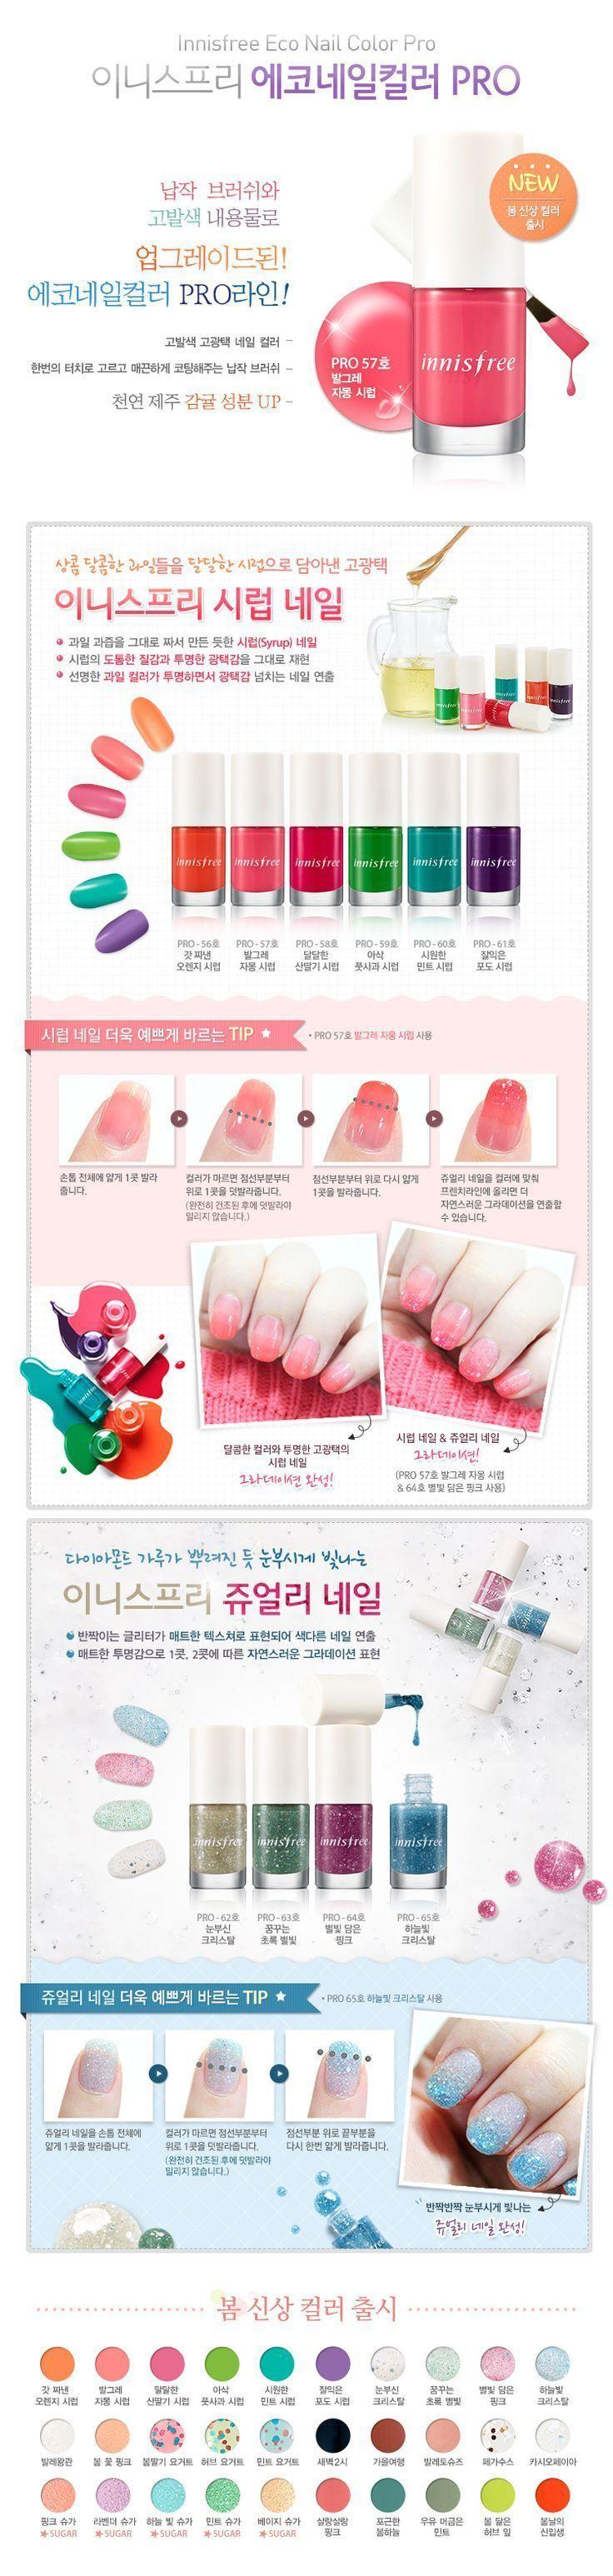 20 Best Of Nail Art Jakarta Innisfree Eco Nail Color Pro 20 Best Of Nail Art Jakarta Amazon Jade Nail Polish Glitter Nail Art Korean Nails Korean Nail Art